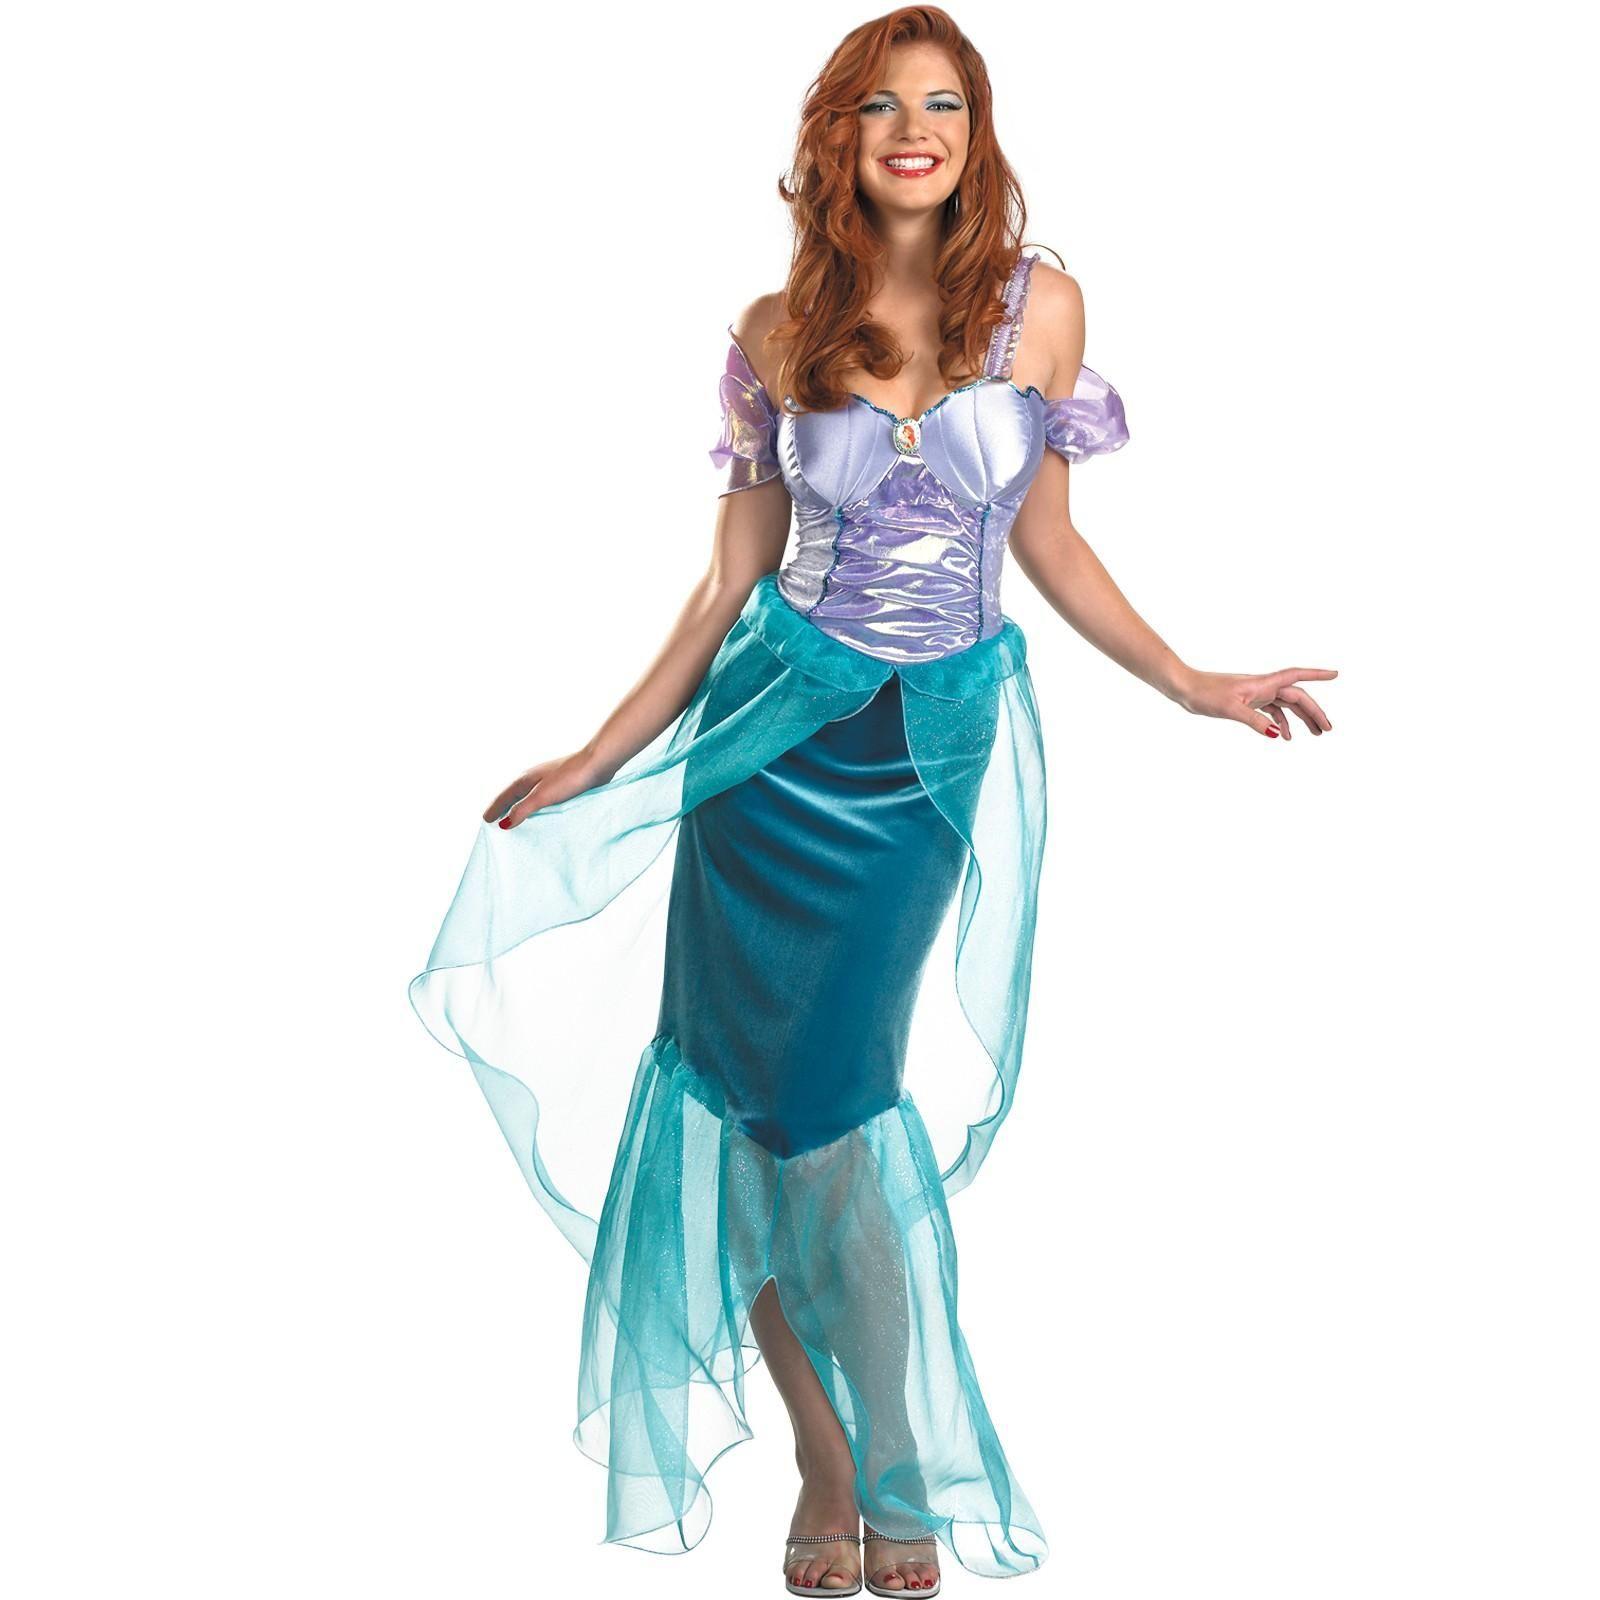 ariel costume - Google Search